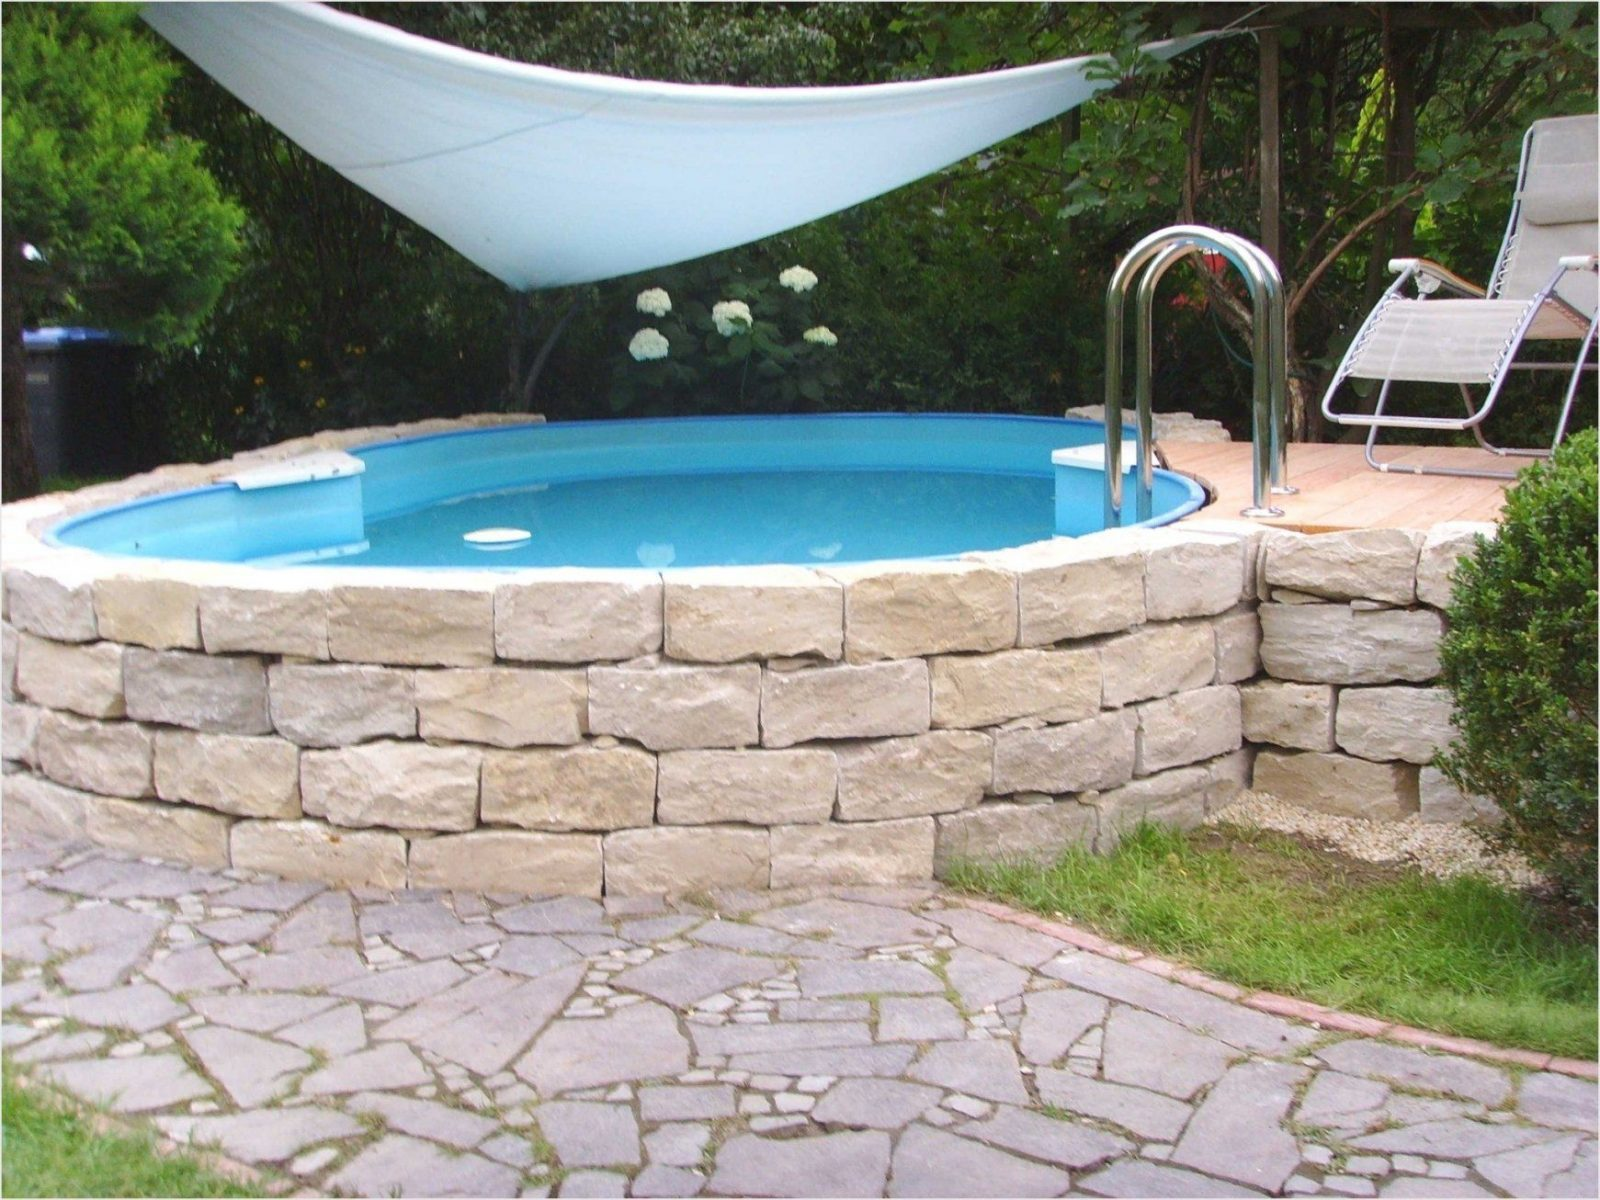 Mini Pool Garten Atemberaubend Muster Über Mini Pool Garten von Mini Pool Im Garten Bild